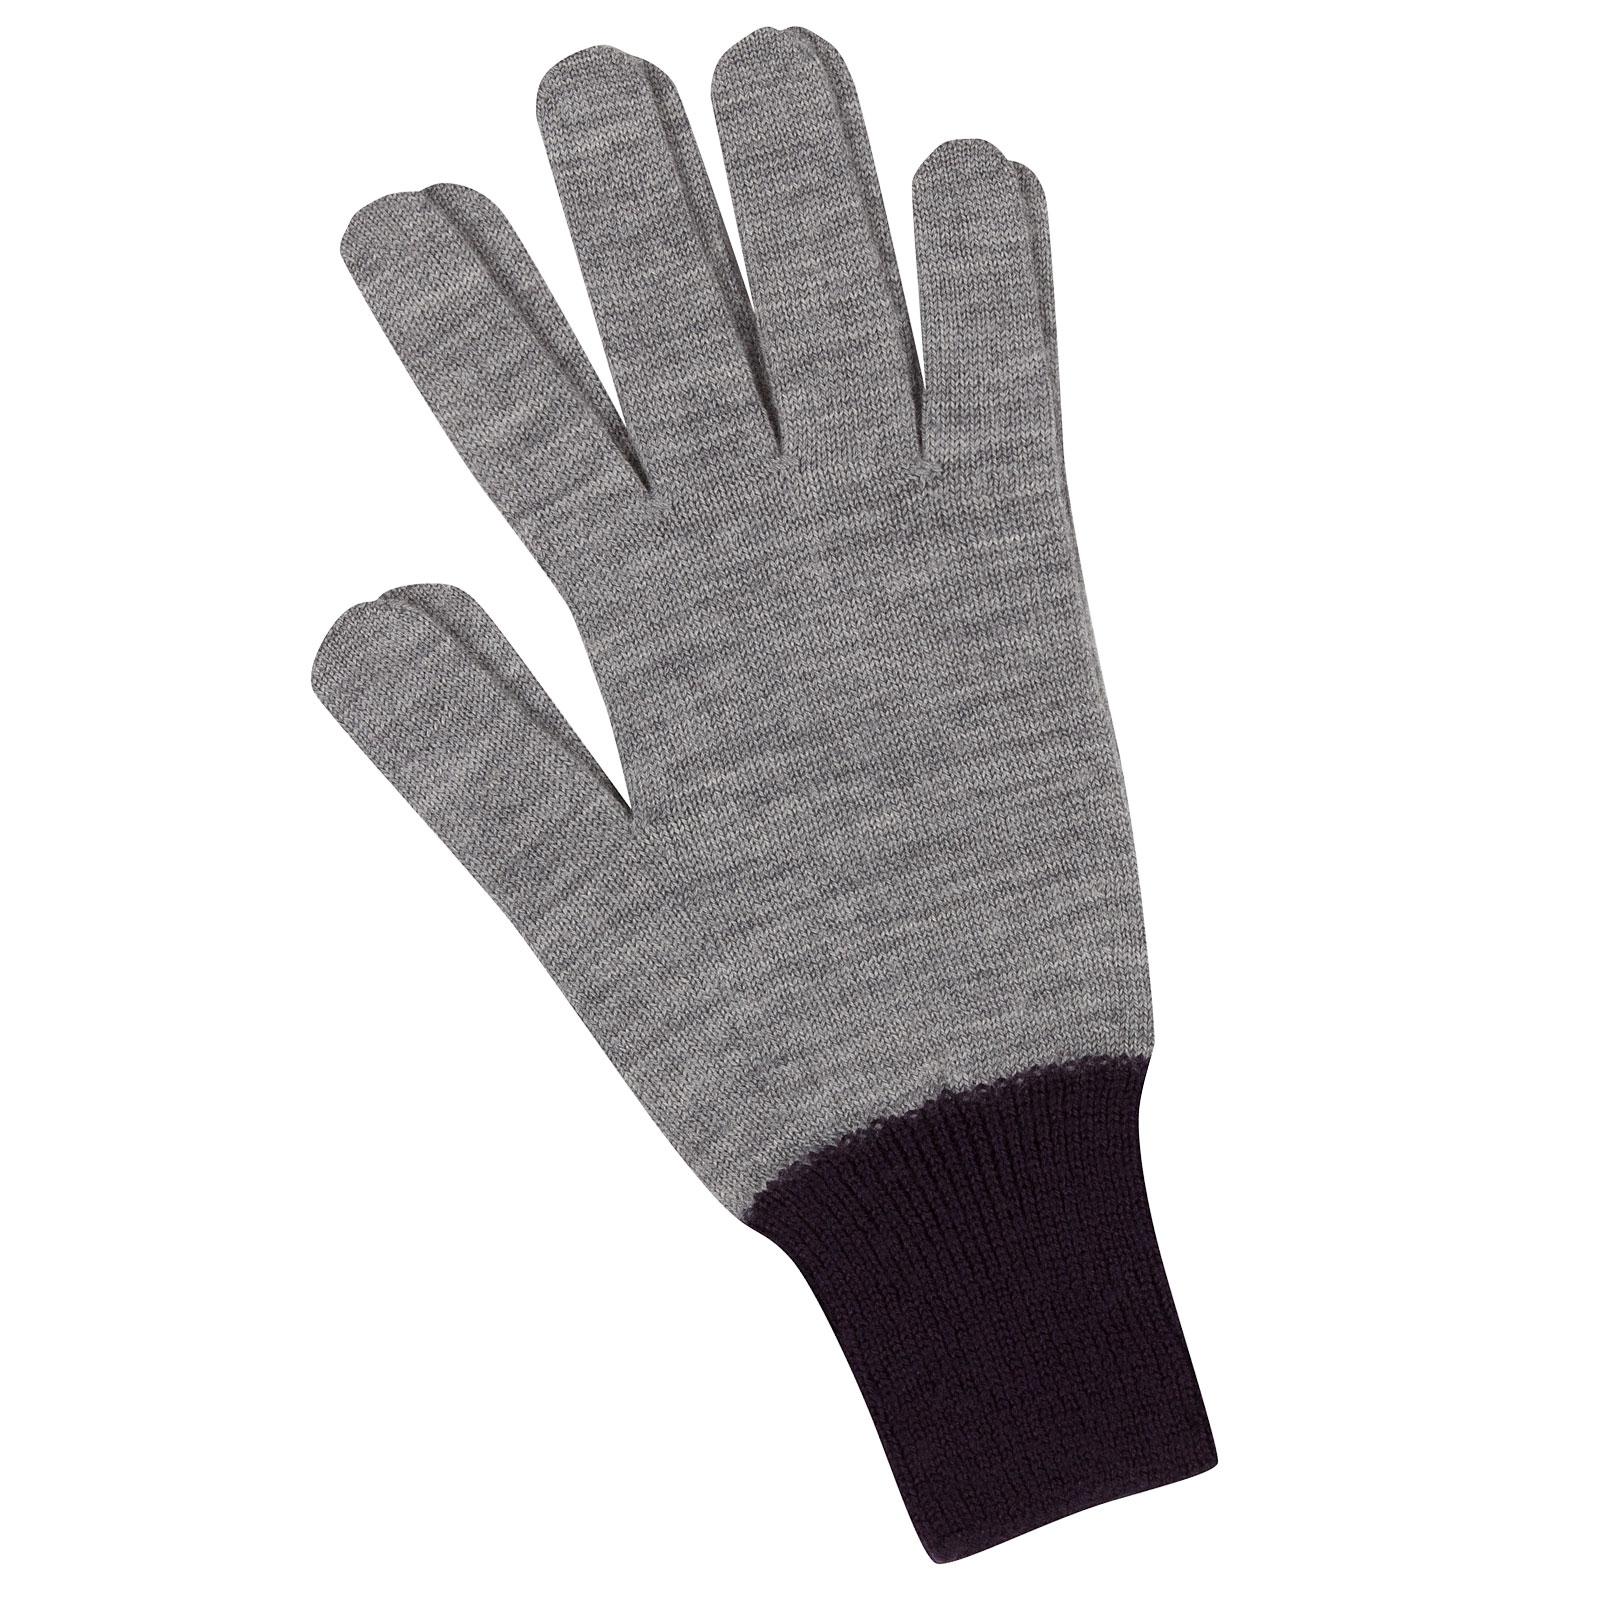 John Smedley Pasteur Merino Wool Gloves in Silver-m/l